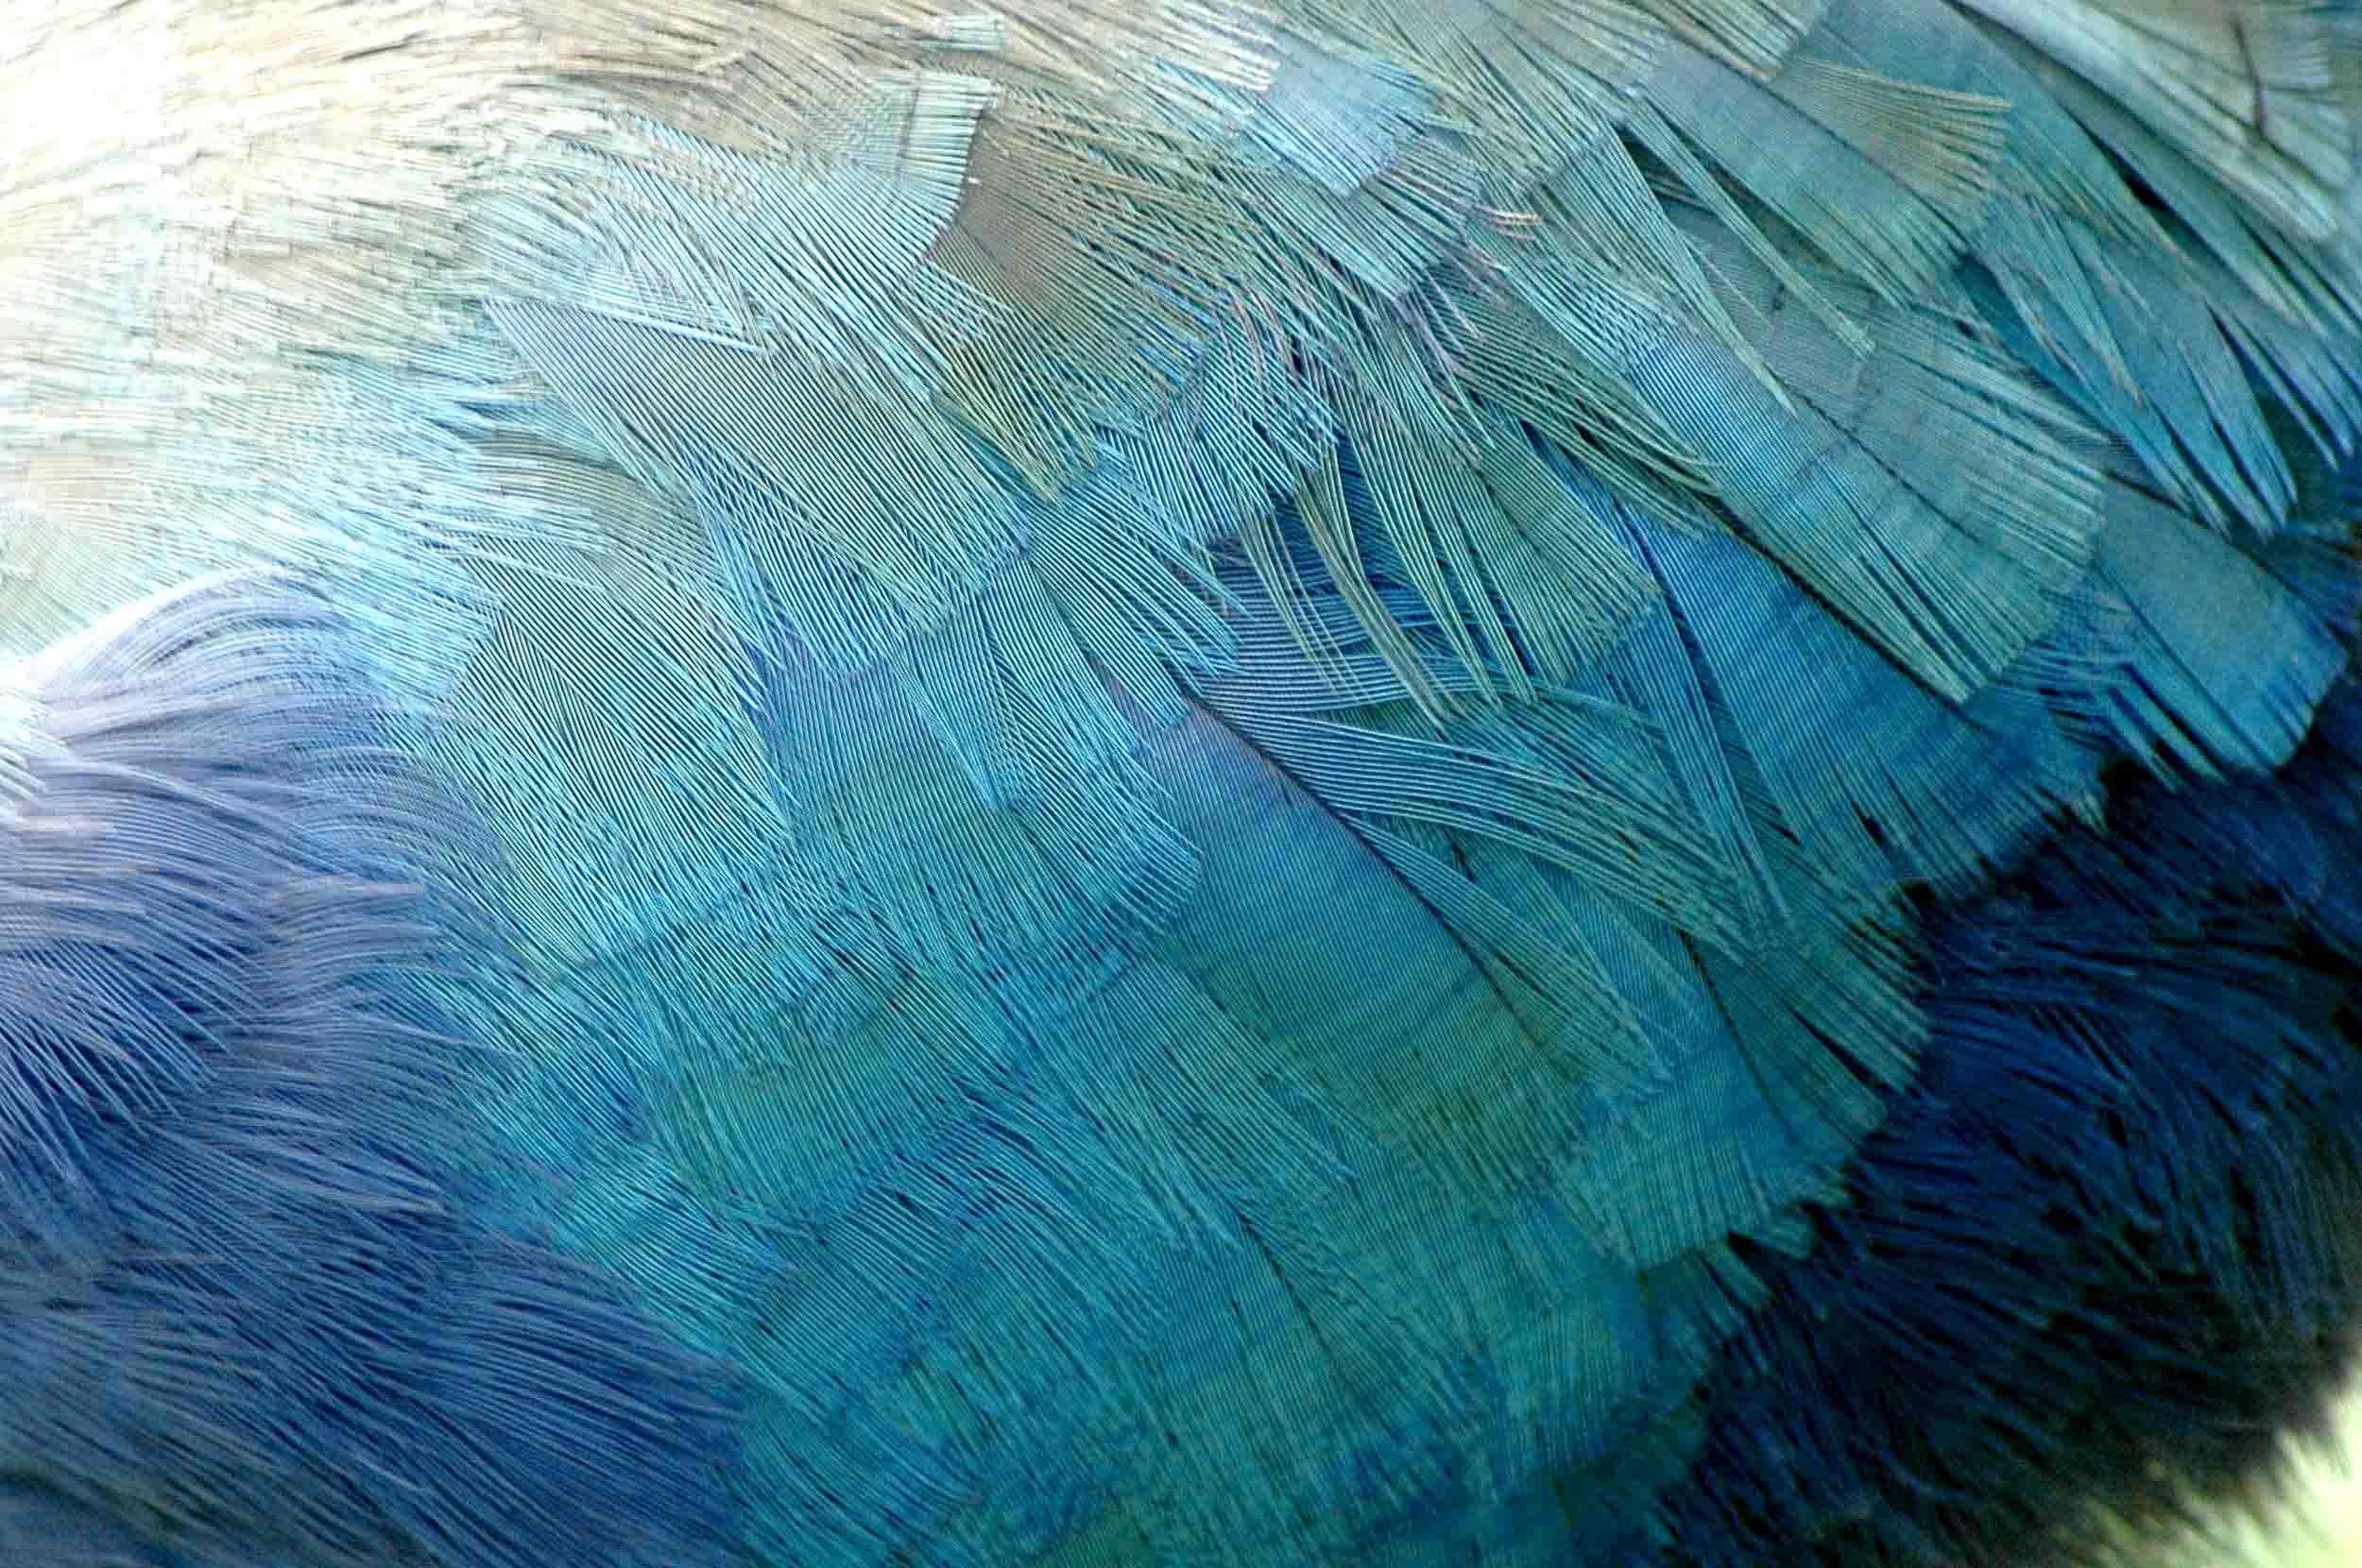 Takahe feathers, New Zealand